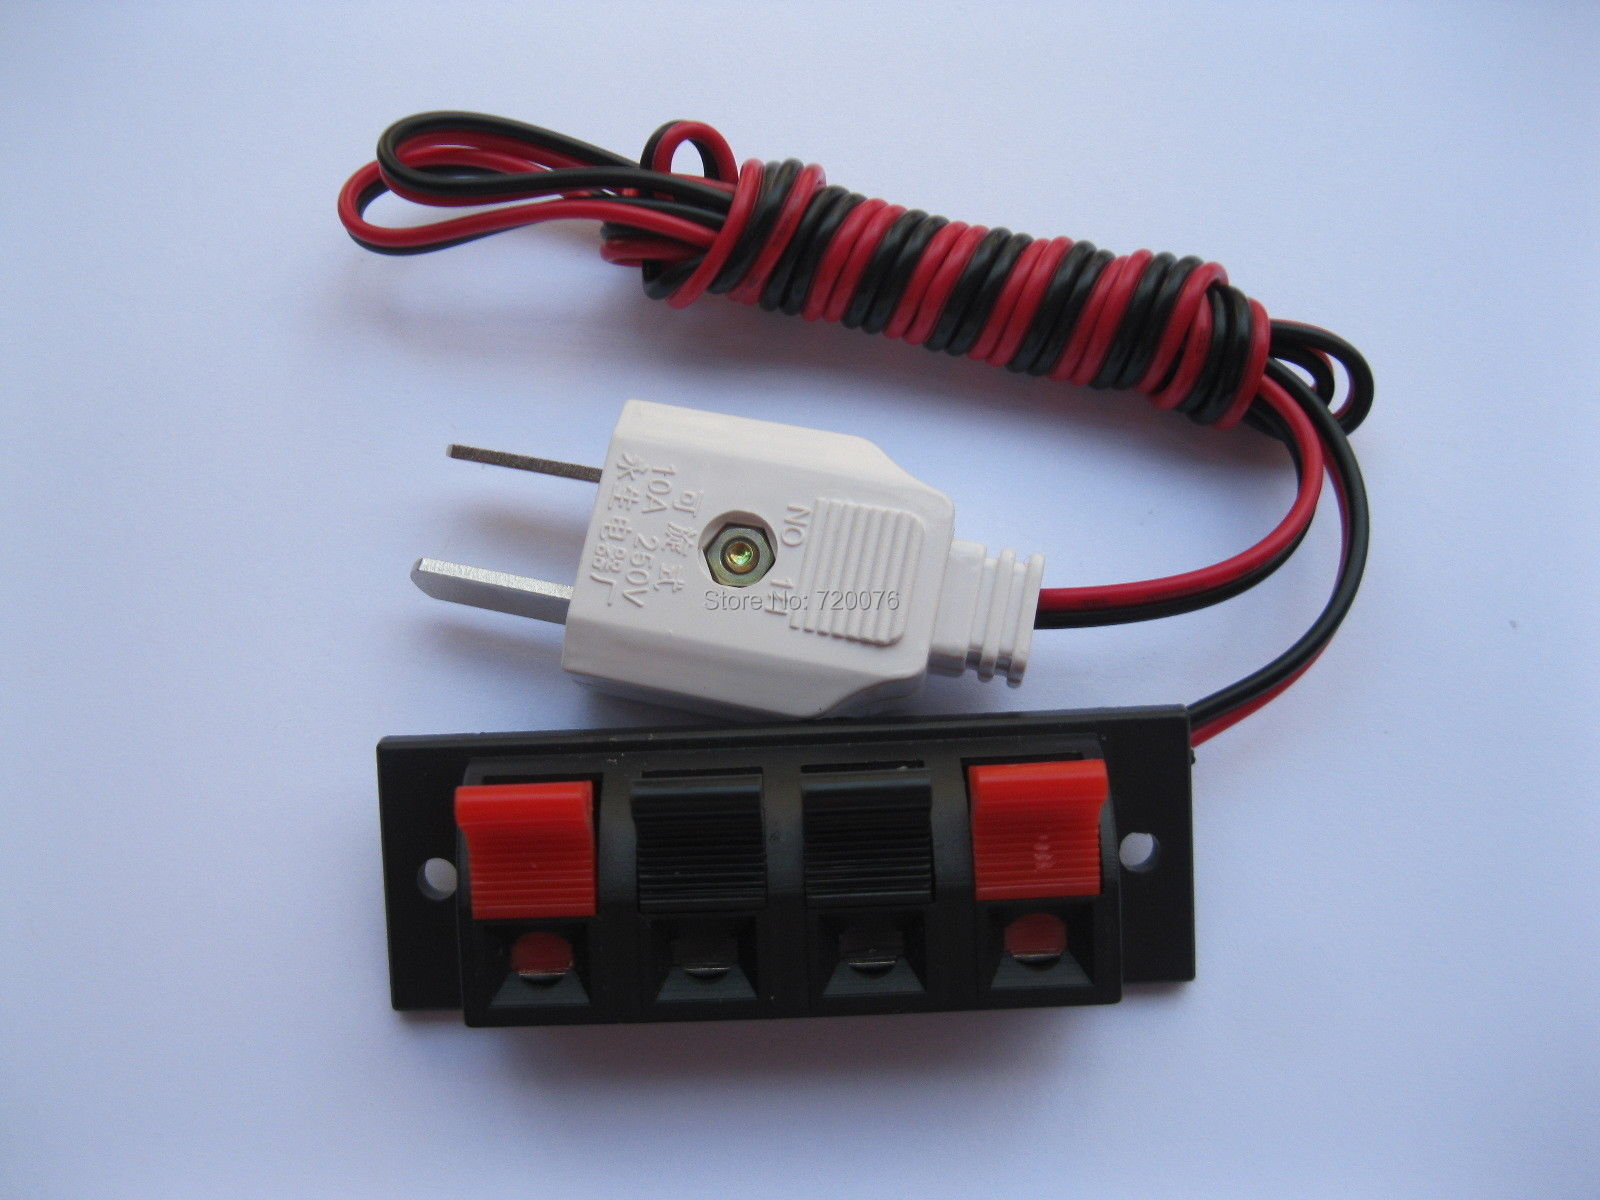 цена на 6 pcs Speaker Terminal Board Spring Loaded 4-Way With Adapter Plug 1.5m